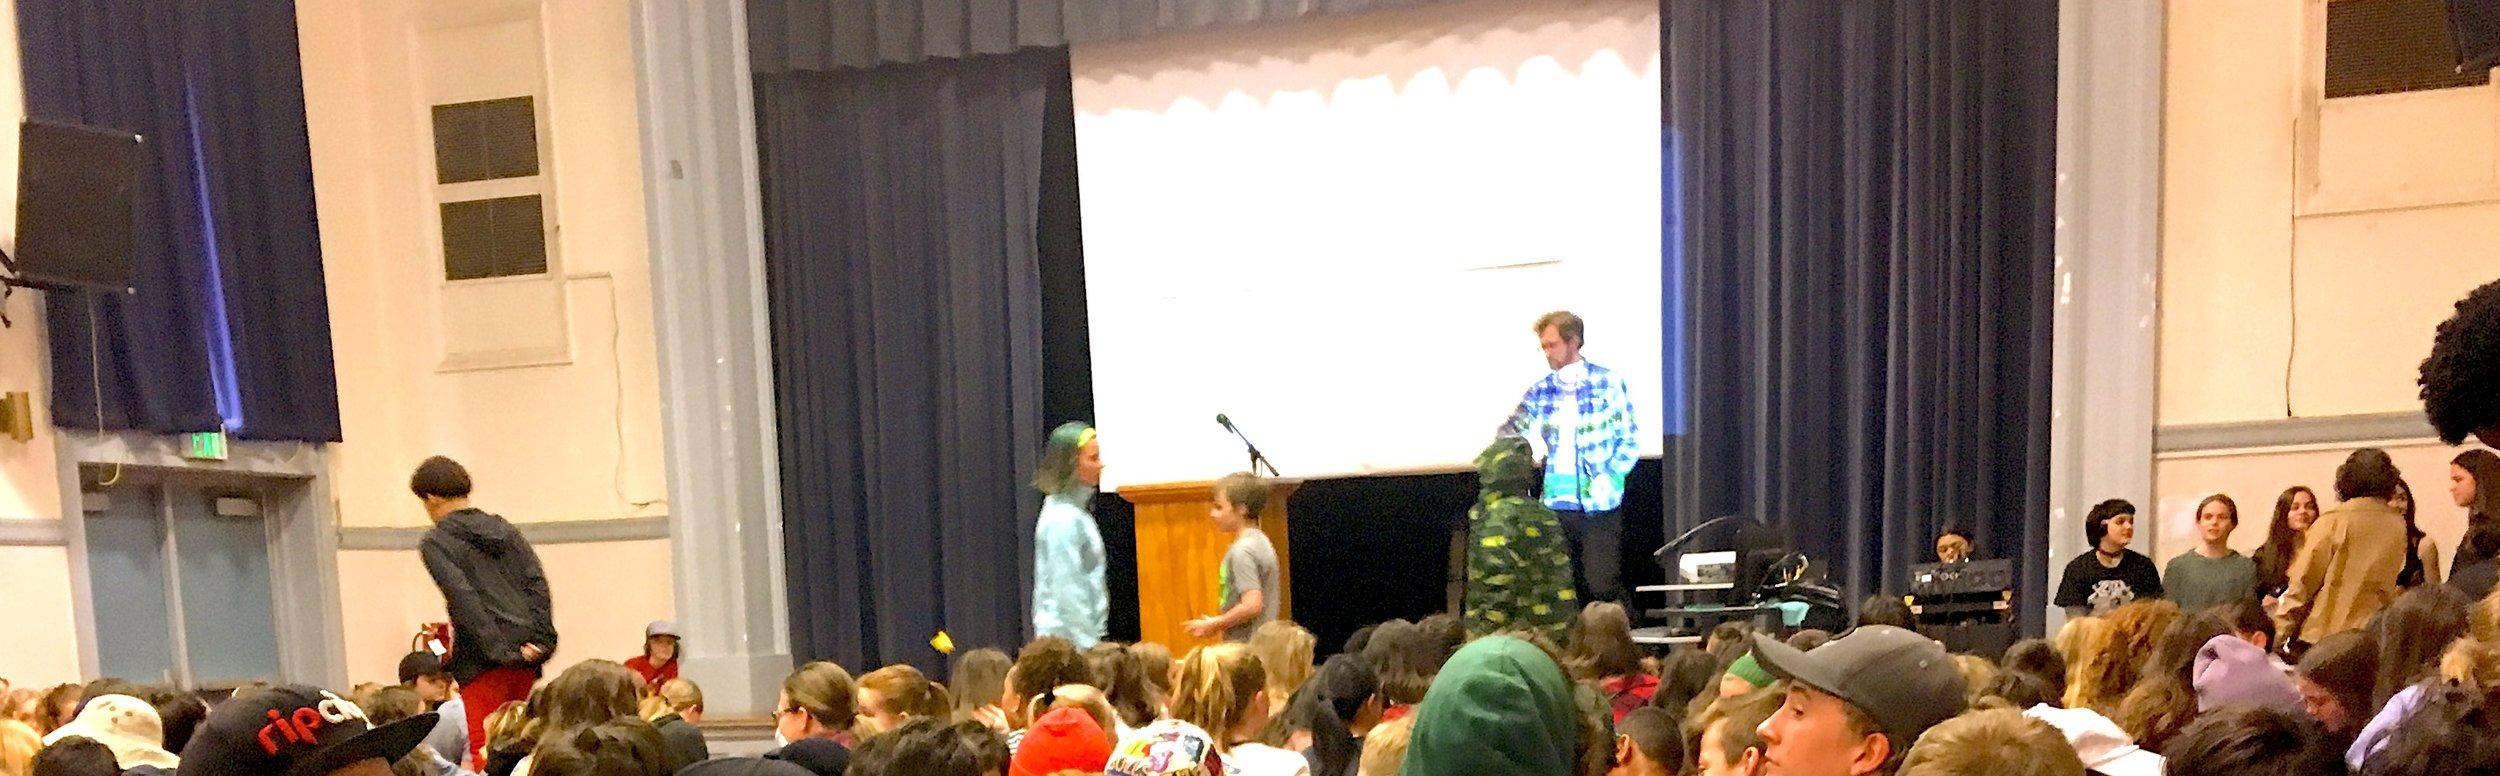 Sunnyside Environmental School, Portland Oregon